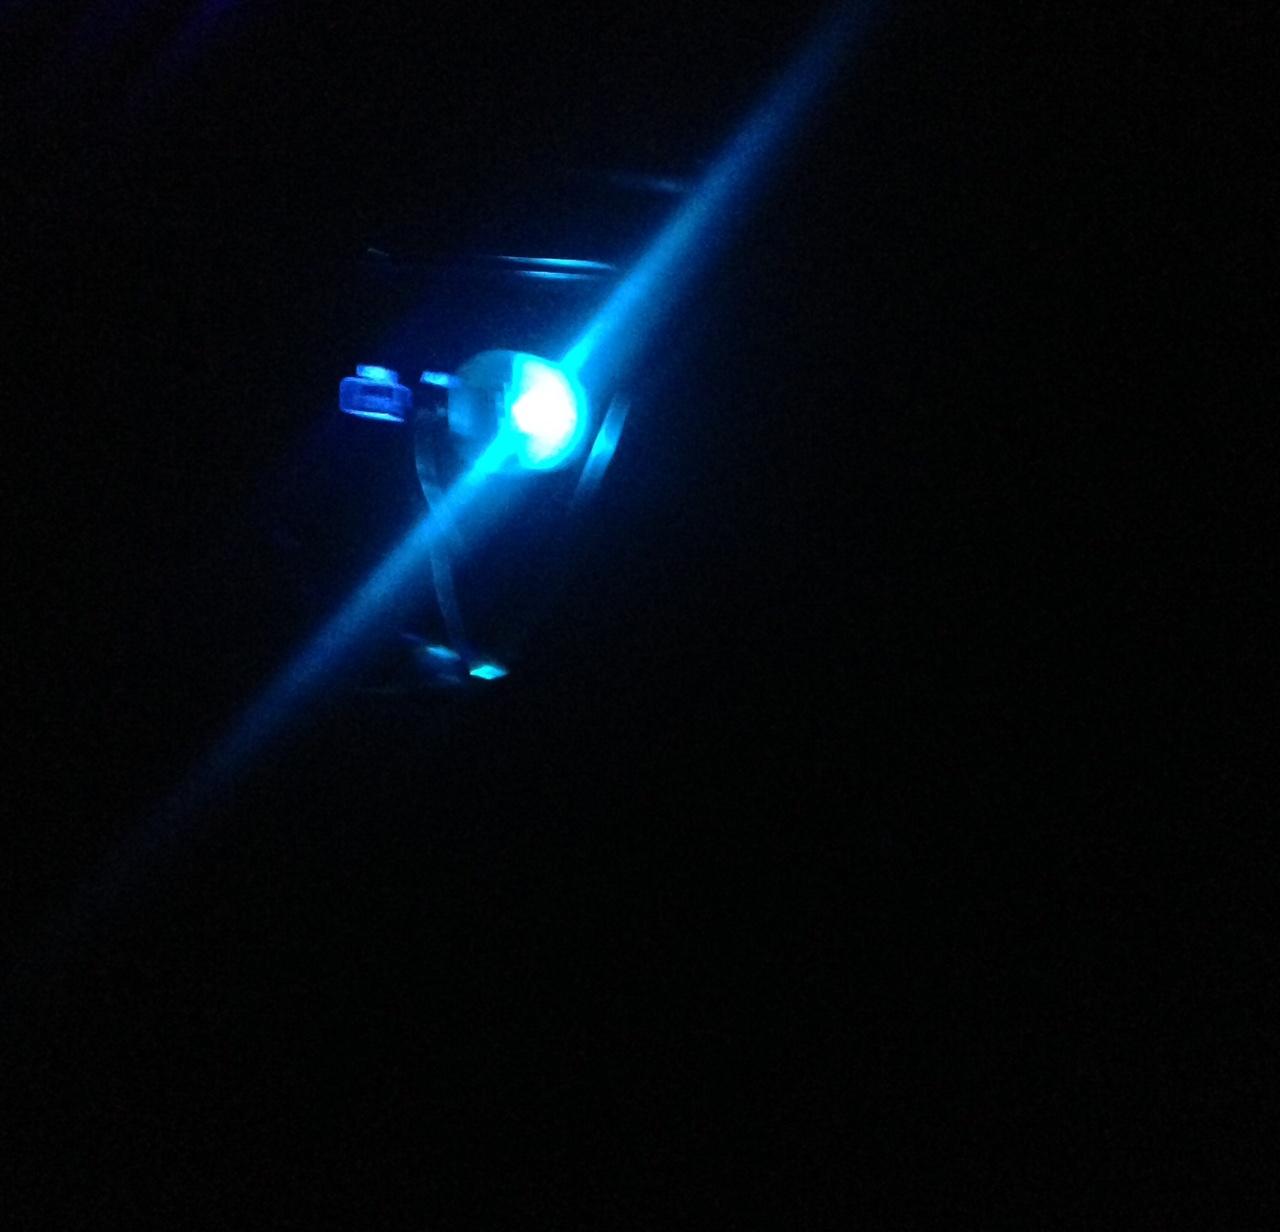 blue-light